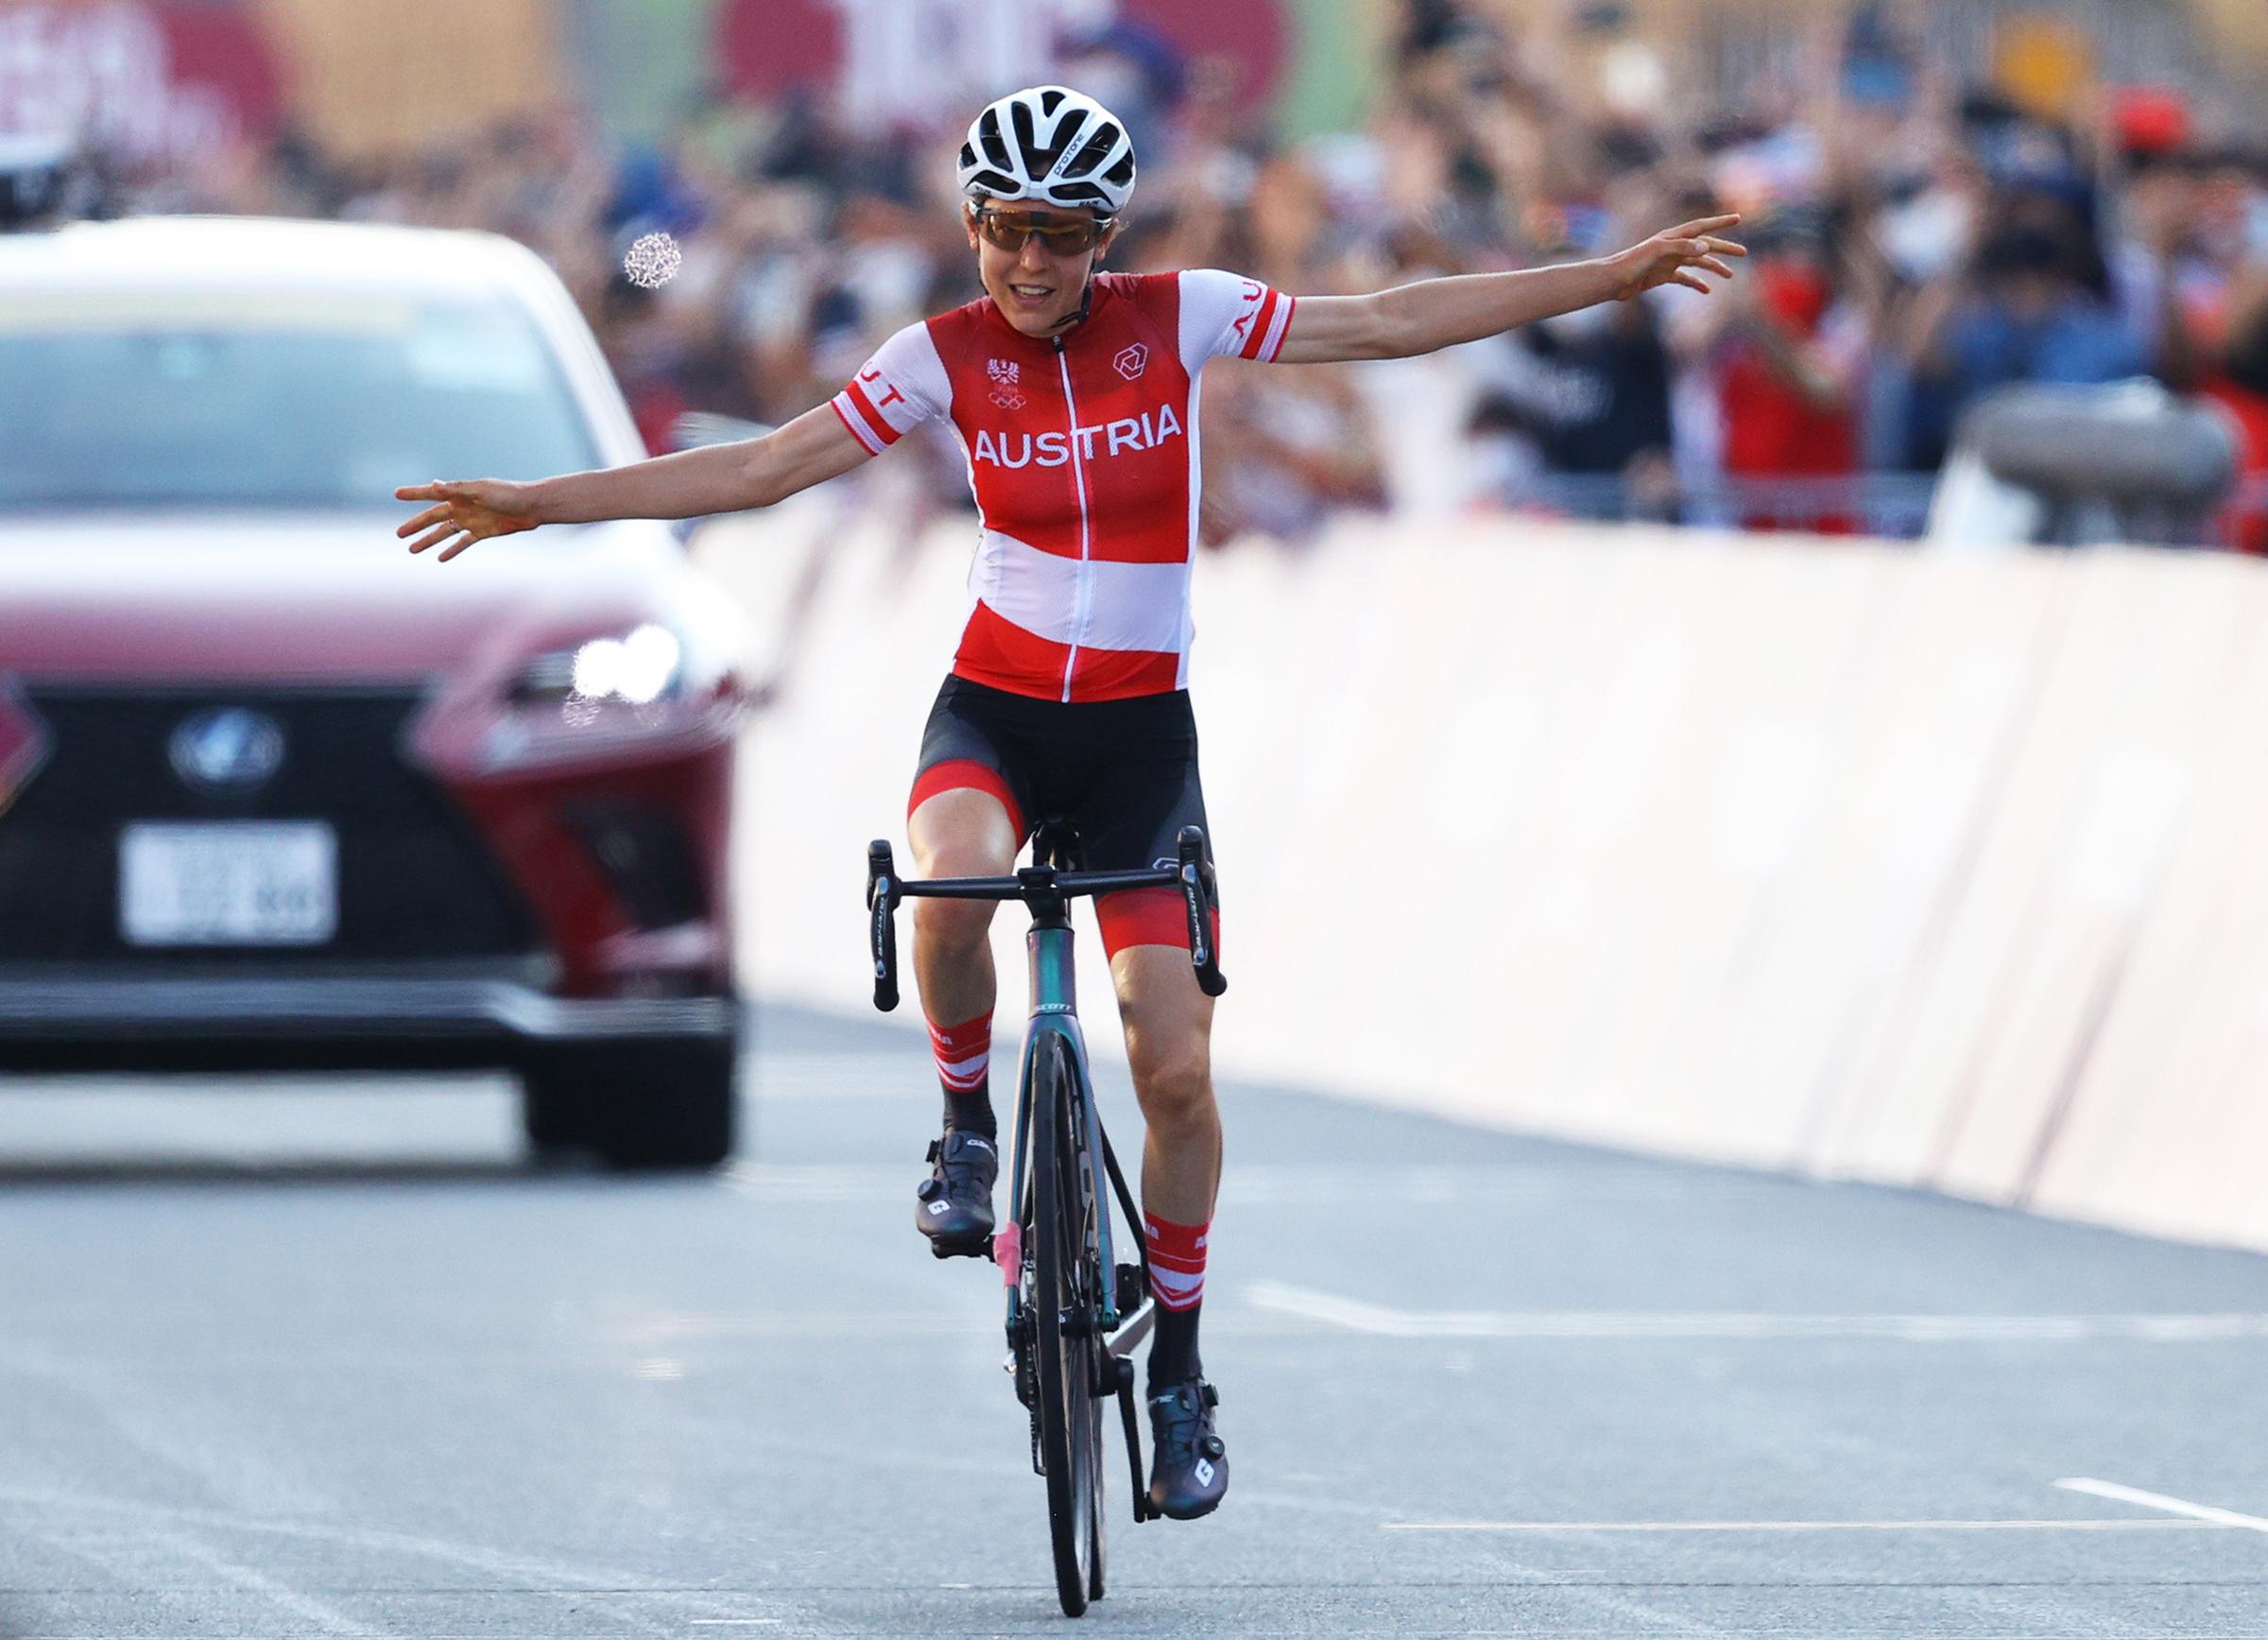 Austria's Anna Kiesenhofer celebrates winning the women's road race on July 25.